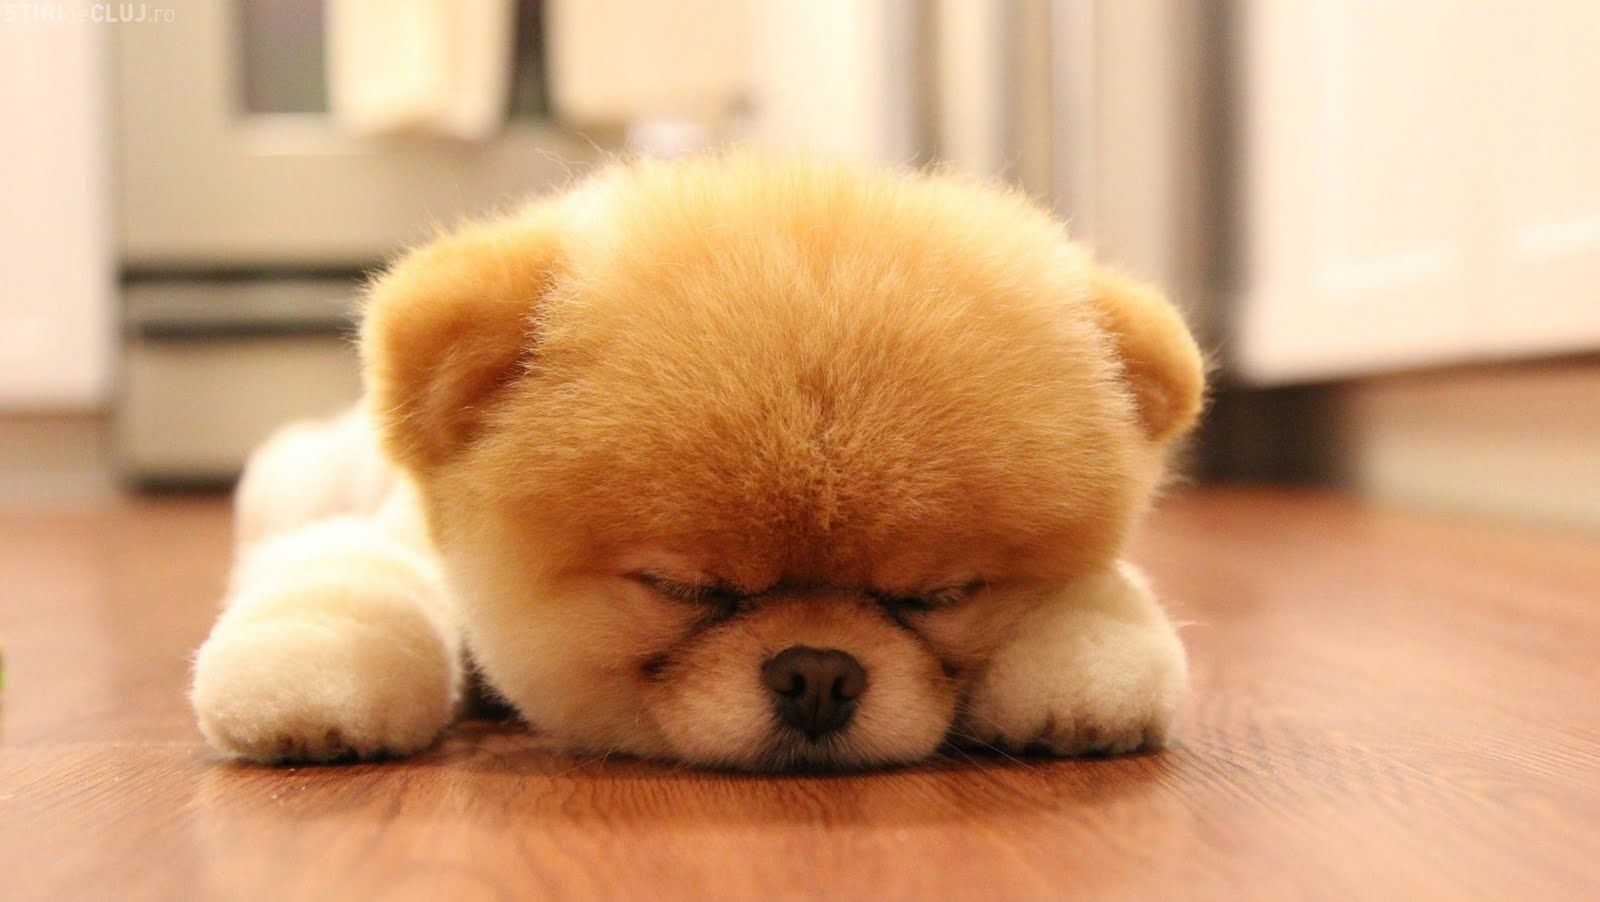 Wonderful Boo Chubby Adorable Dog - 63b80b1ad0517c91ab07f27b43ae24e9  2018_3387  .jpg